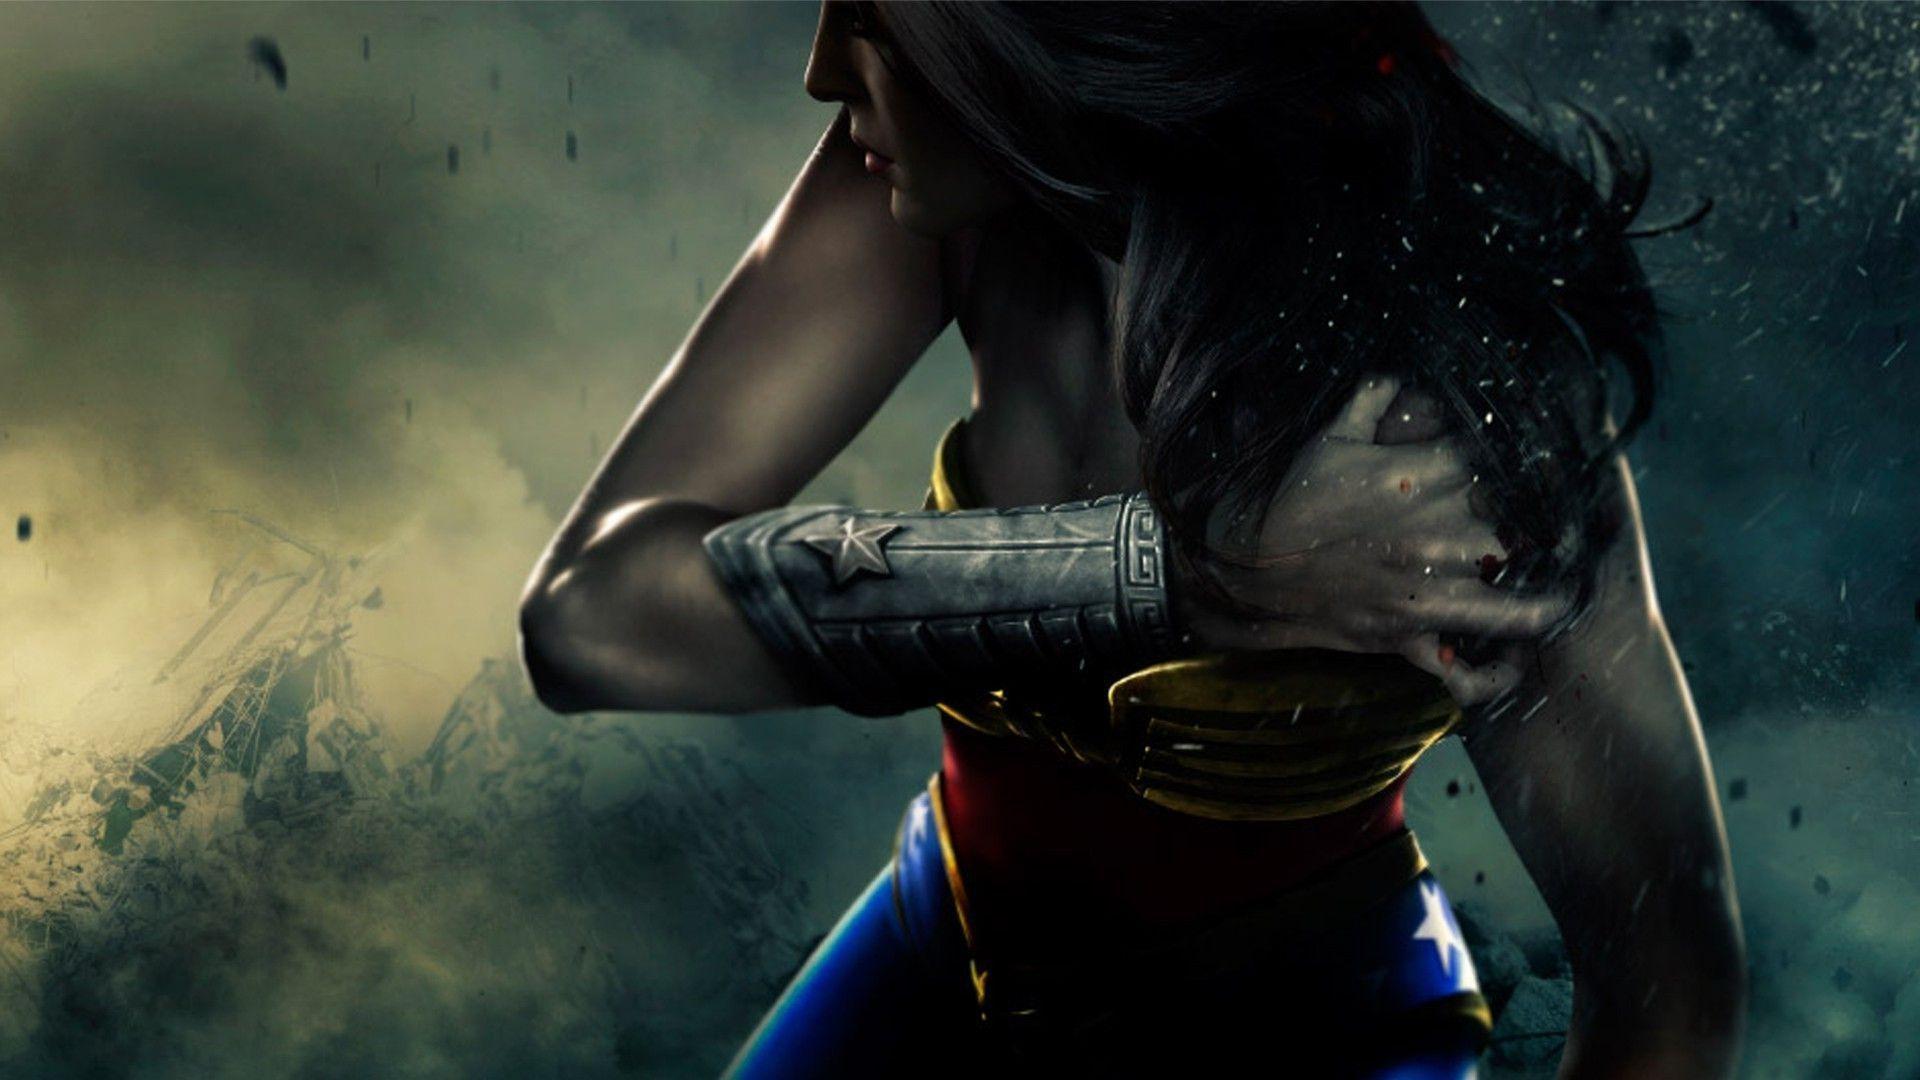 Wonder Woman Wallpaper Desktop ~ Sdeerwallpaper